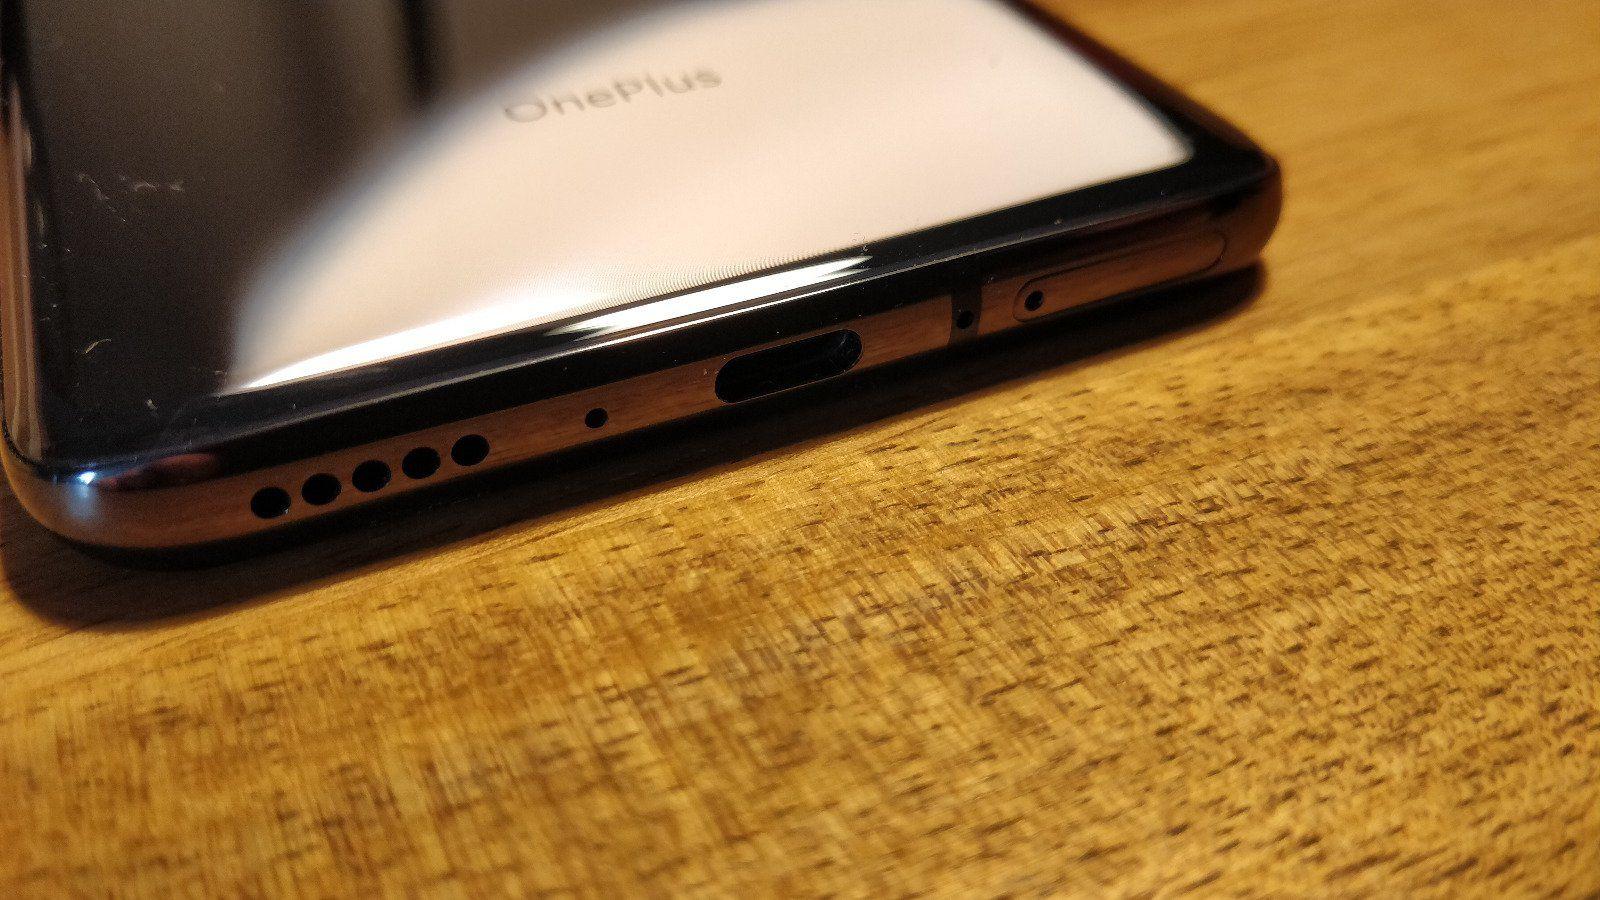 Oneplus 7 Pro im Test: Triple Kamera, Edge Display & vieles mehr